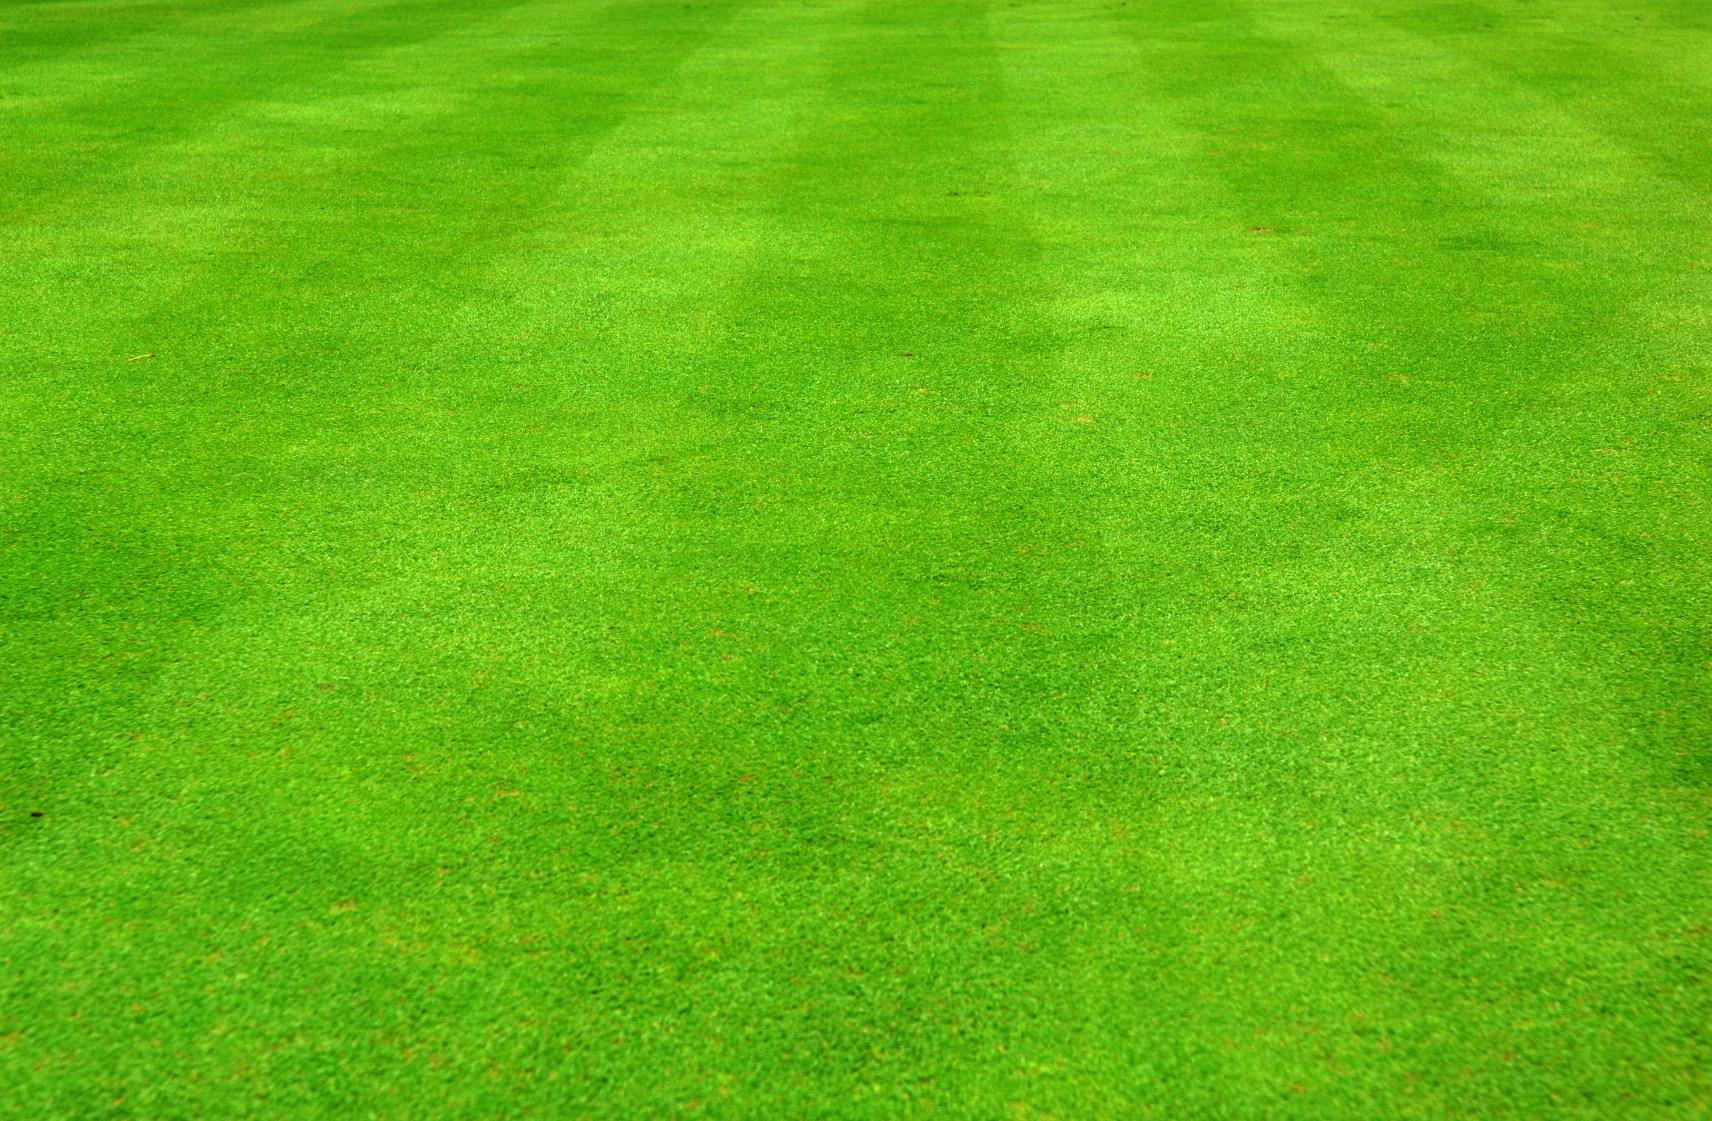 39697a0673e7ef0212a5d18a2f7c52b6_grass-f-39697a0673e7ef0212a5d18a2f7c52b6_grass-field-clipart-dromhfj-soccer-grass- field-clipart_1712-1121-1